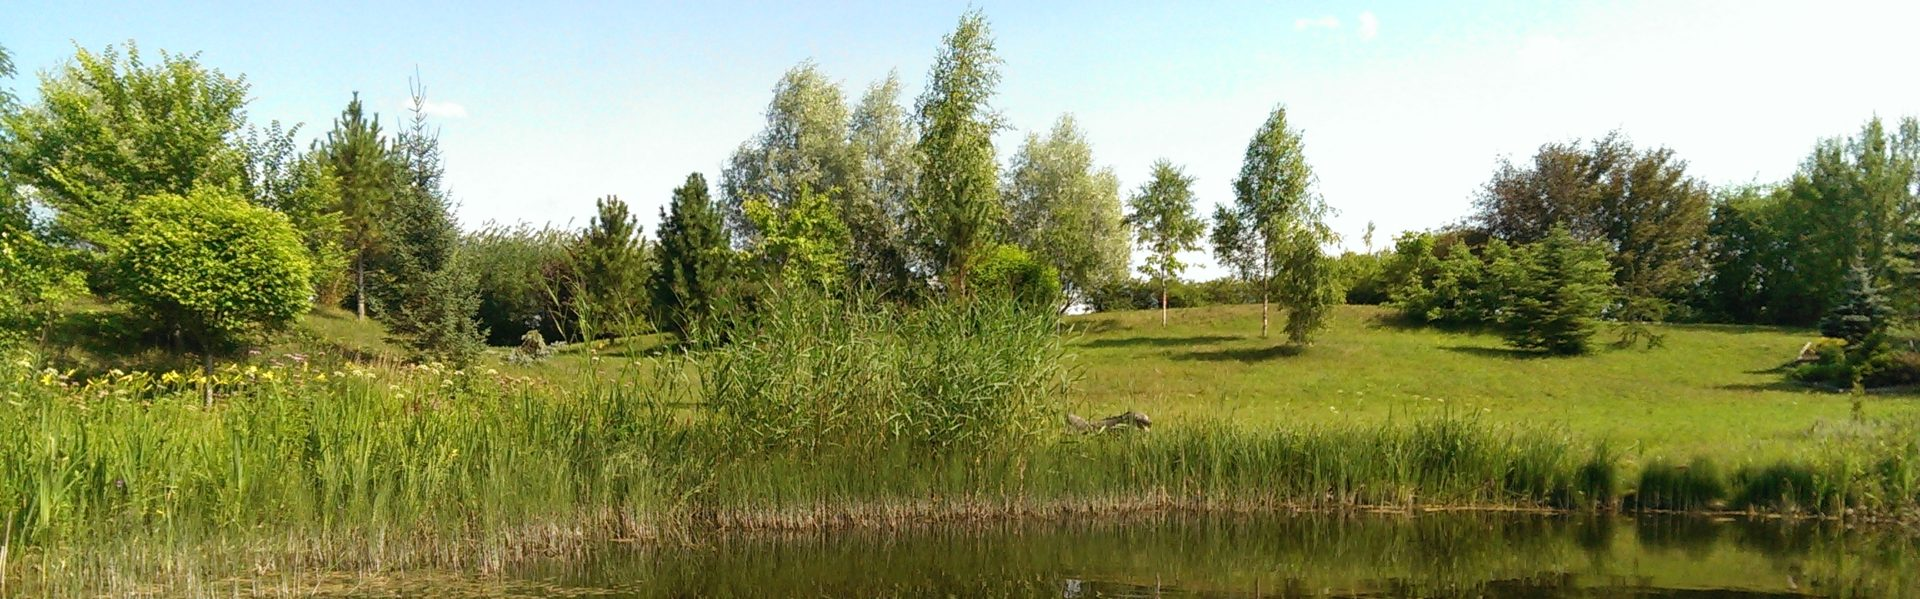 Dendropark Smaragd